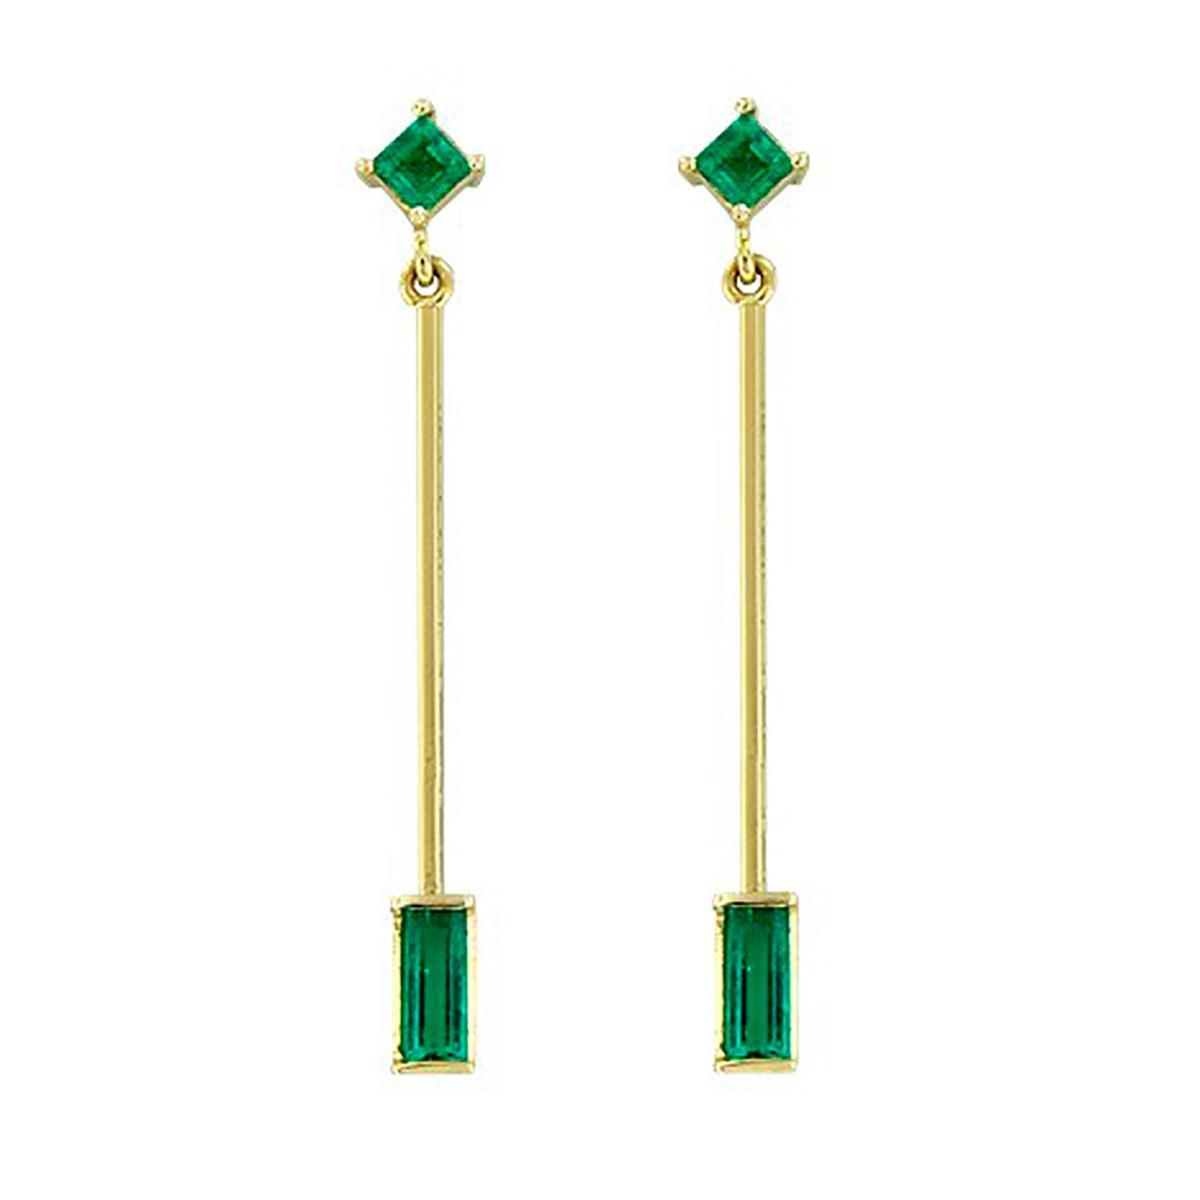 thin-emerald-drop-dangle-earrings-in-18k-yellow-gold